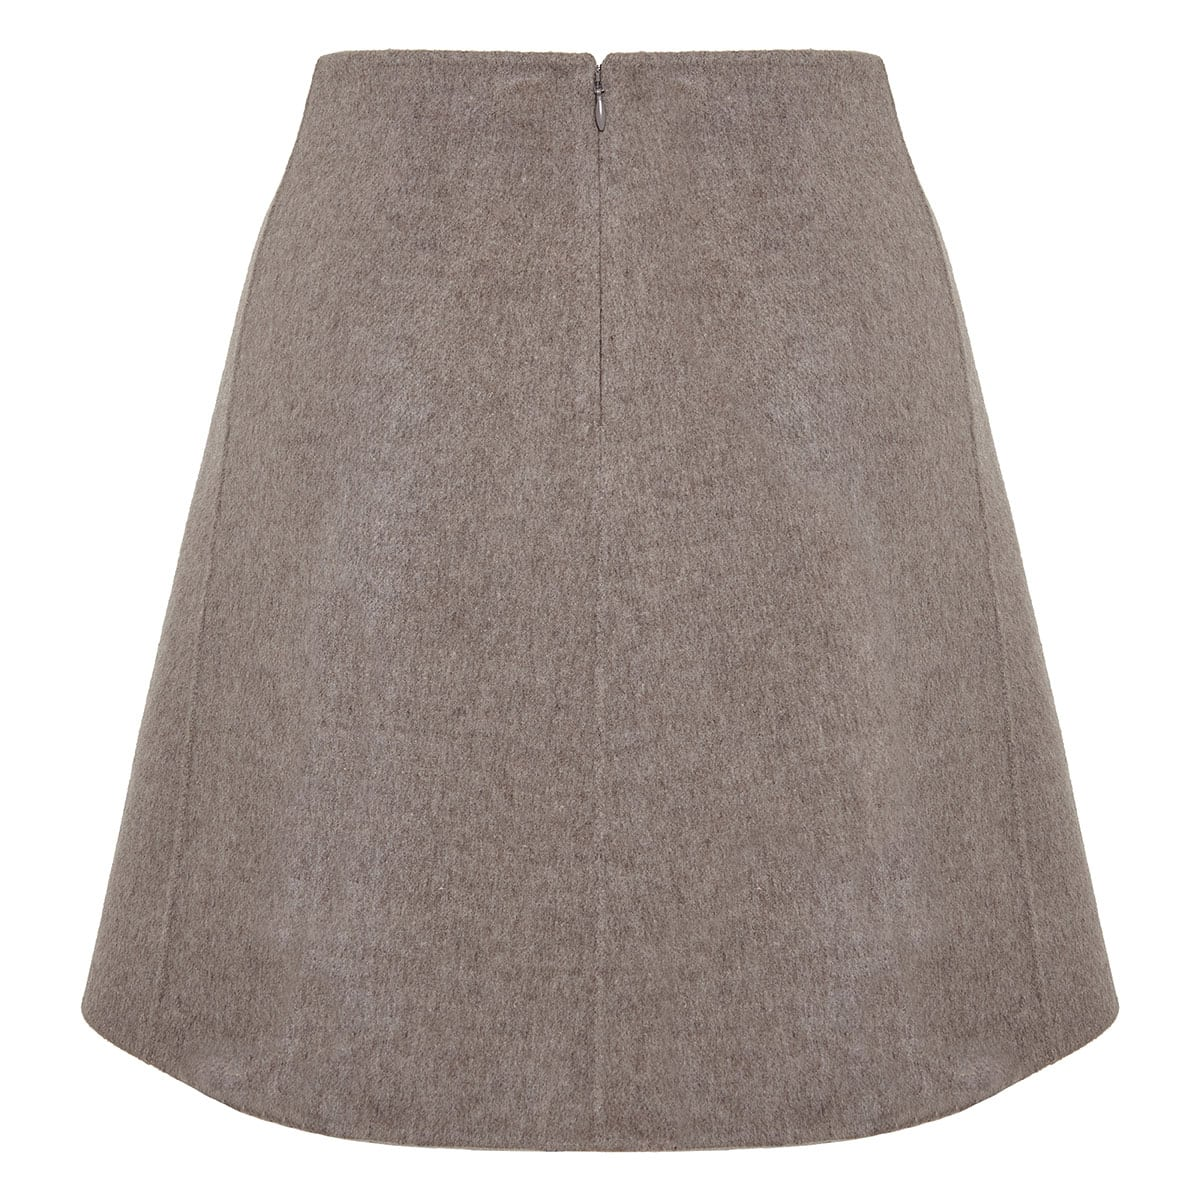 A-line wool mini skirt